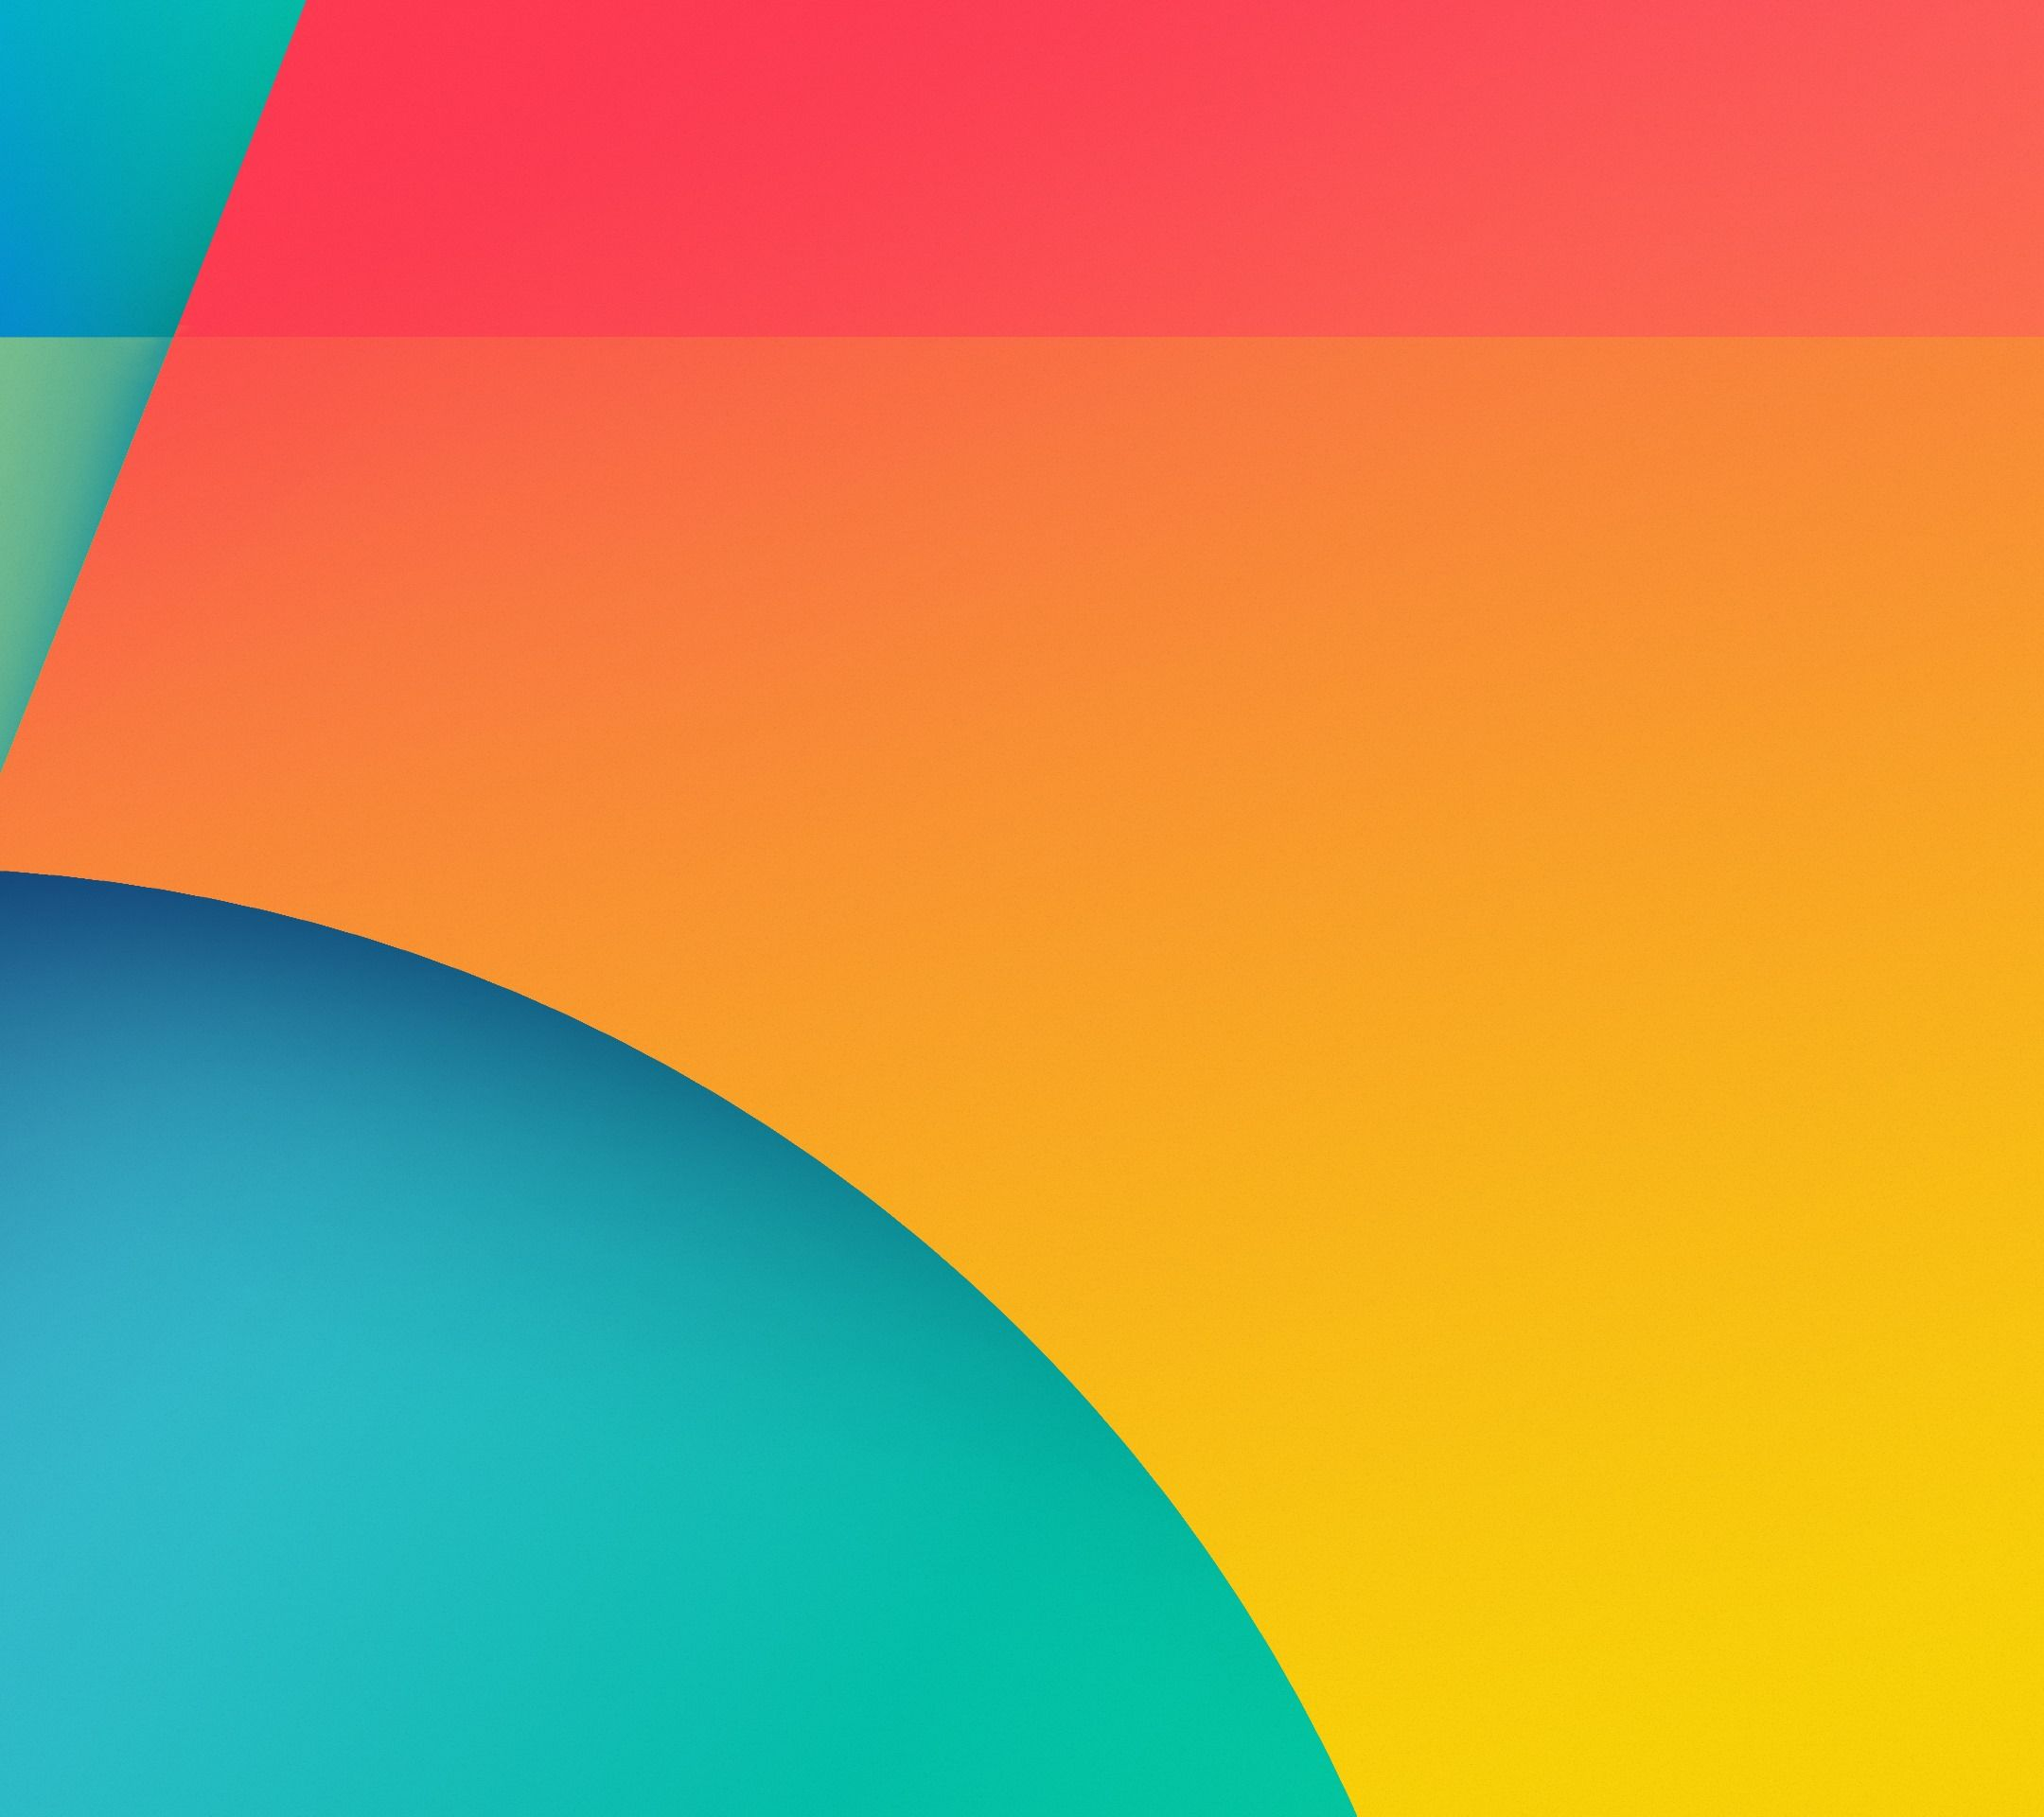 Nexus 7 HD Desktop Wallpaper High Definition Mobile All